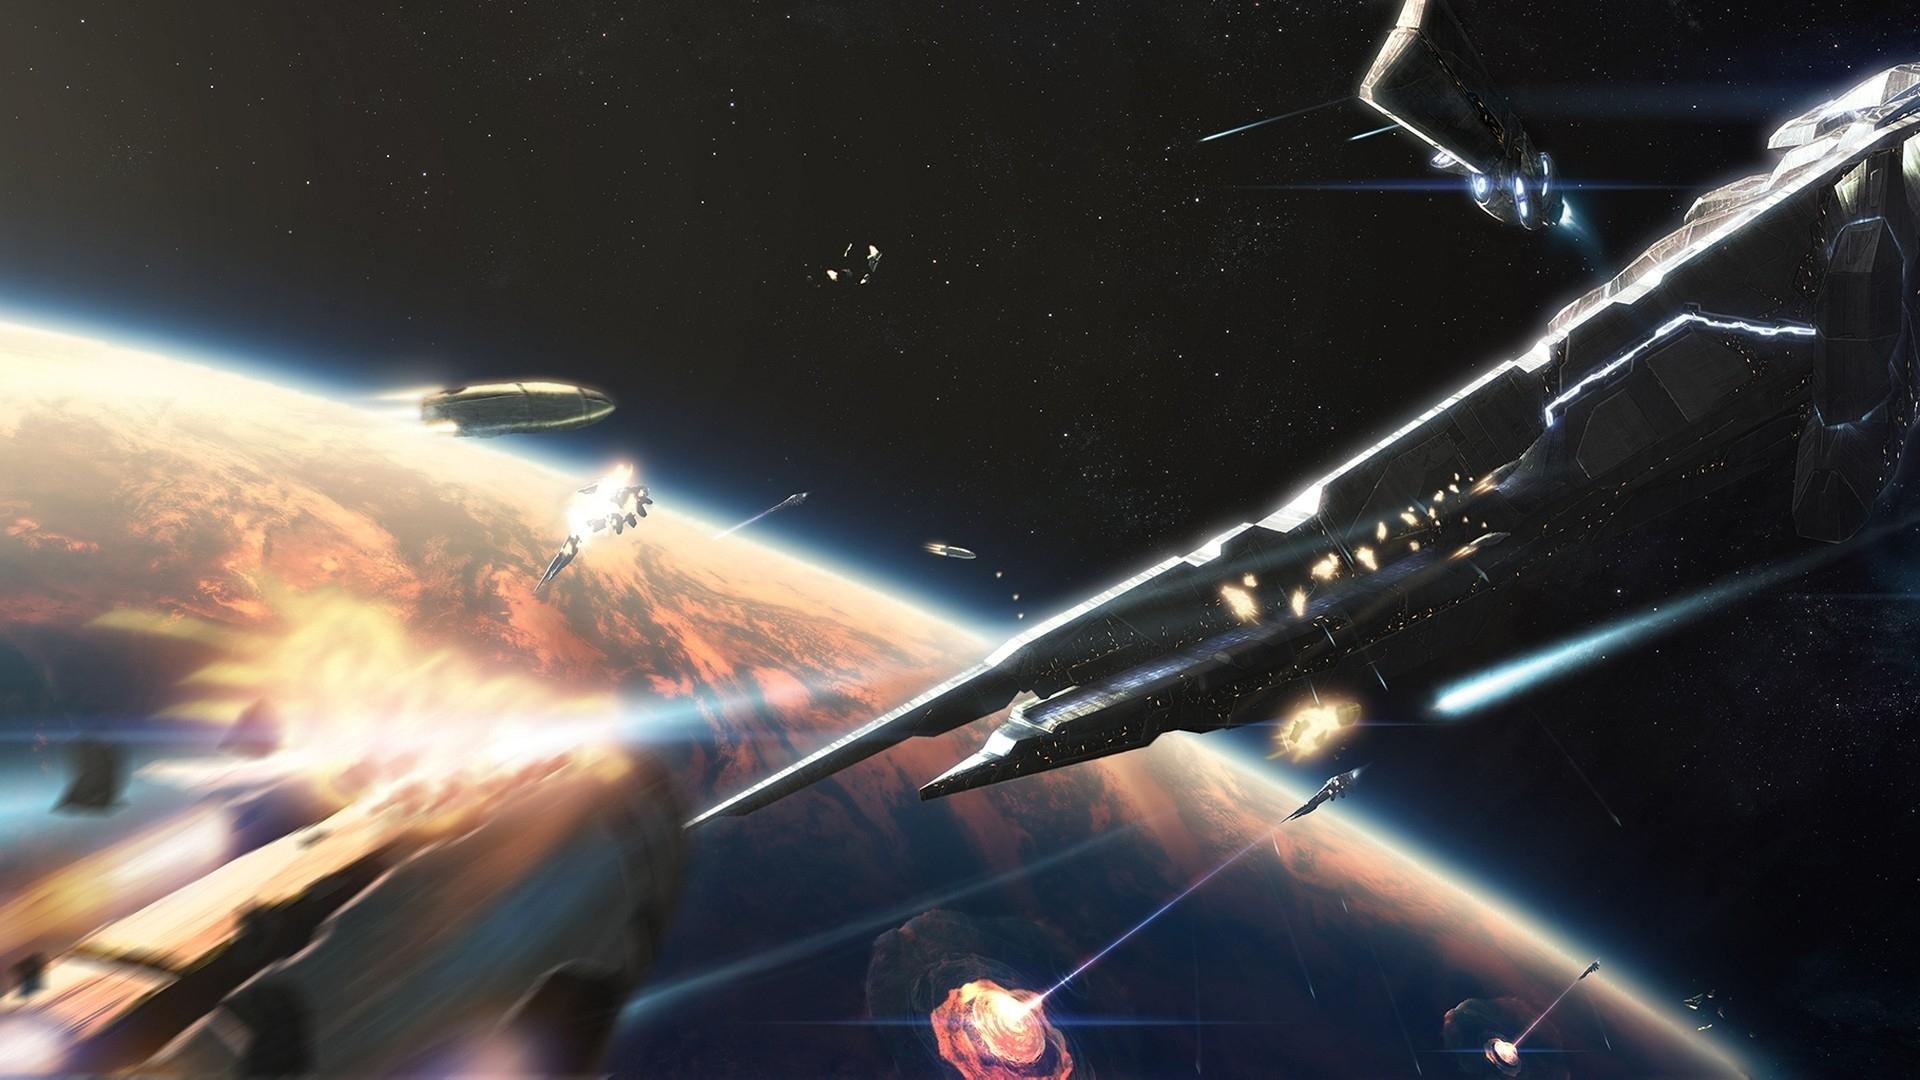 Space battle wallpaper 1920x1080